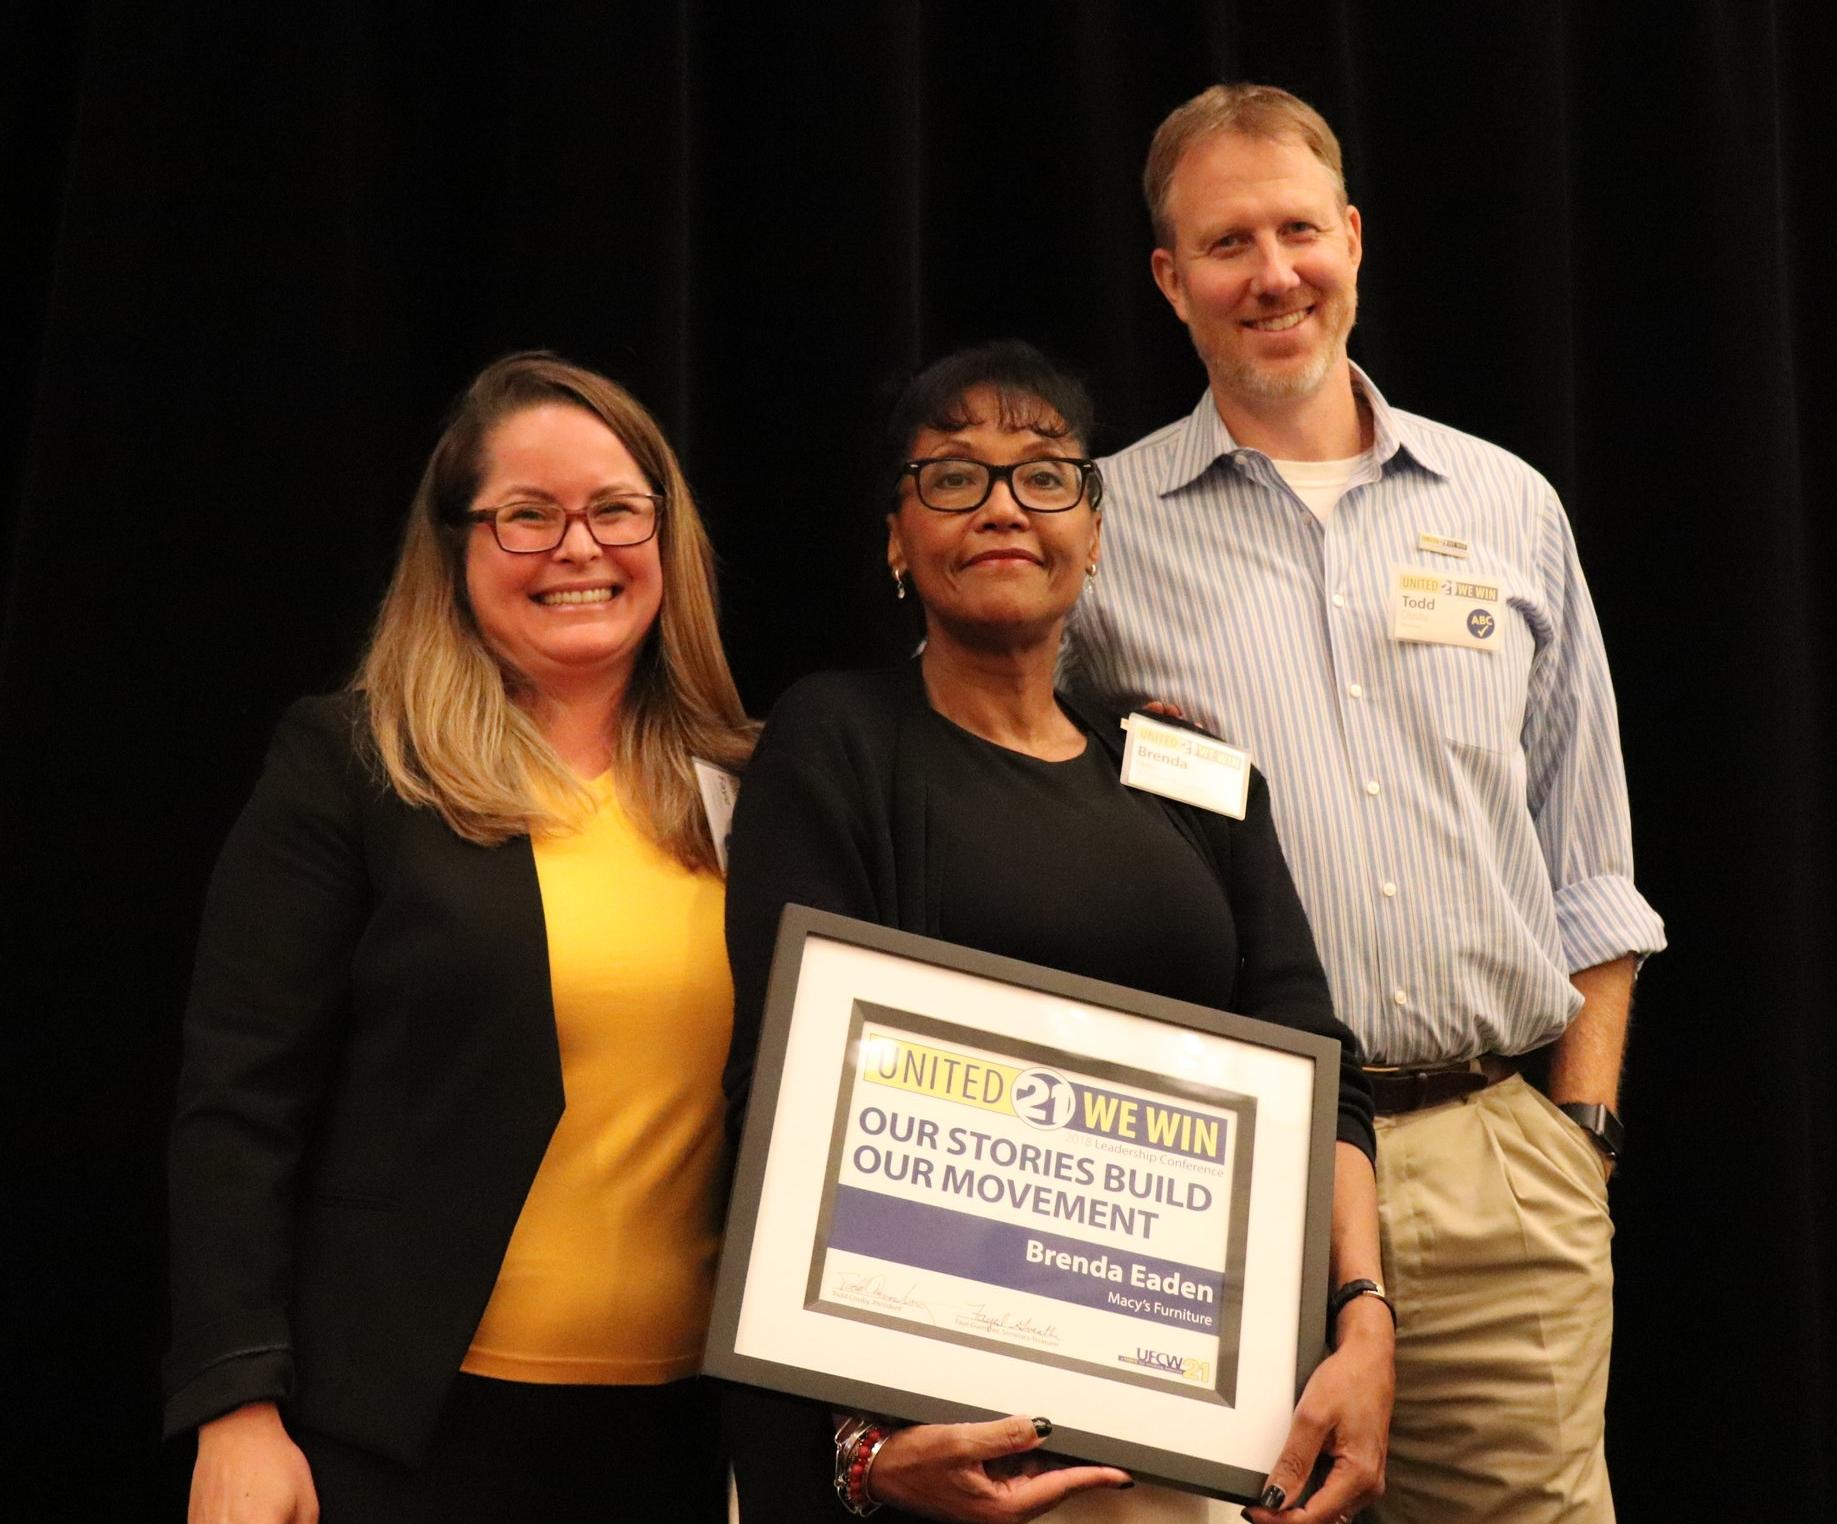 Our Stories Build Our Movement Award winner Brenda Eaden from Macy's